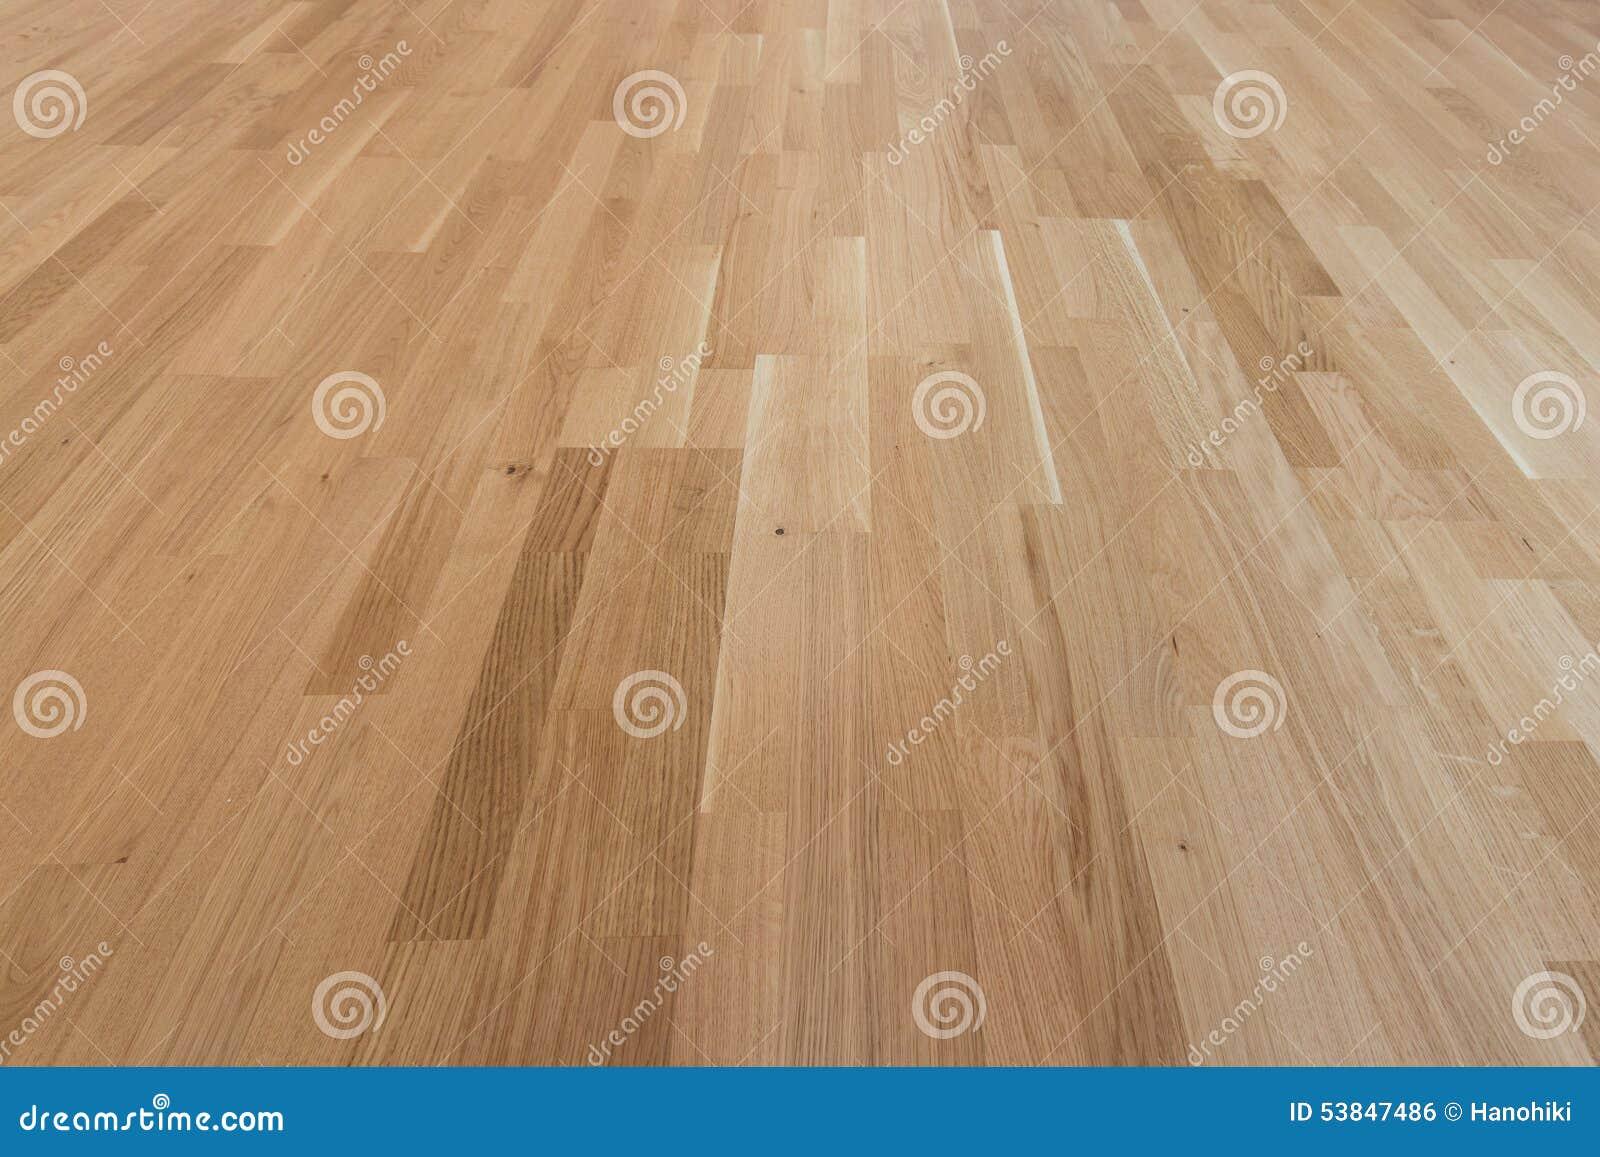 Houten vloer eiken parket laminat stock foto afbeelding